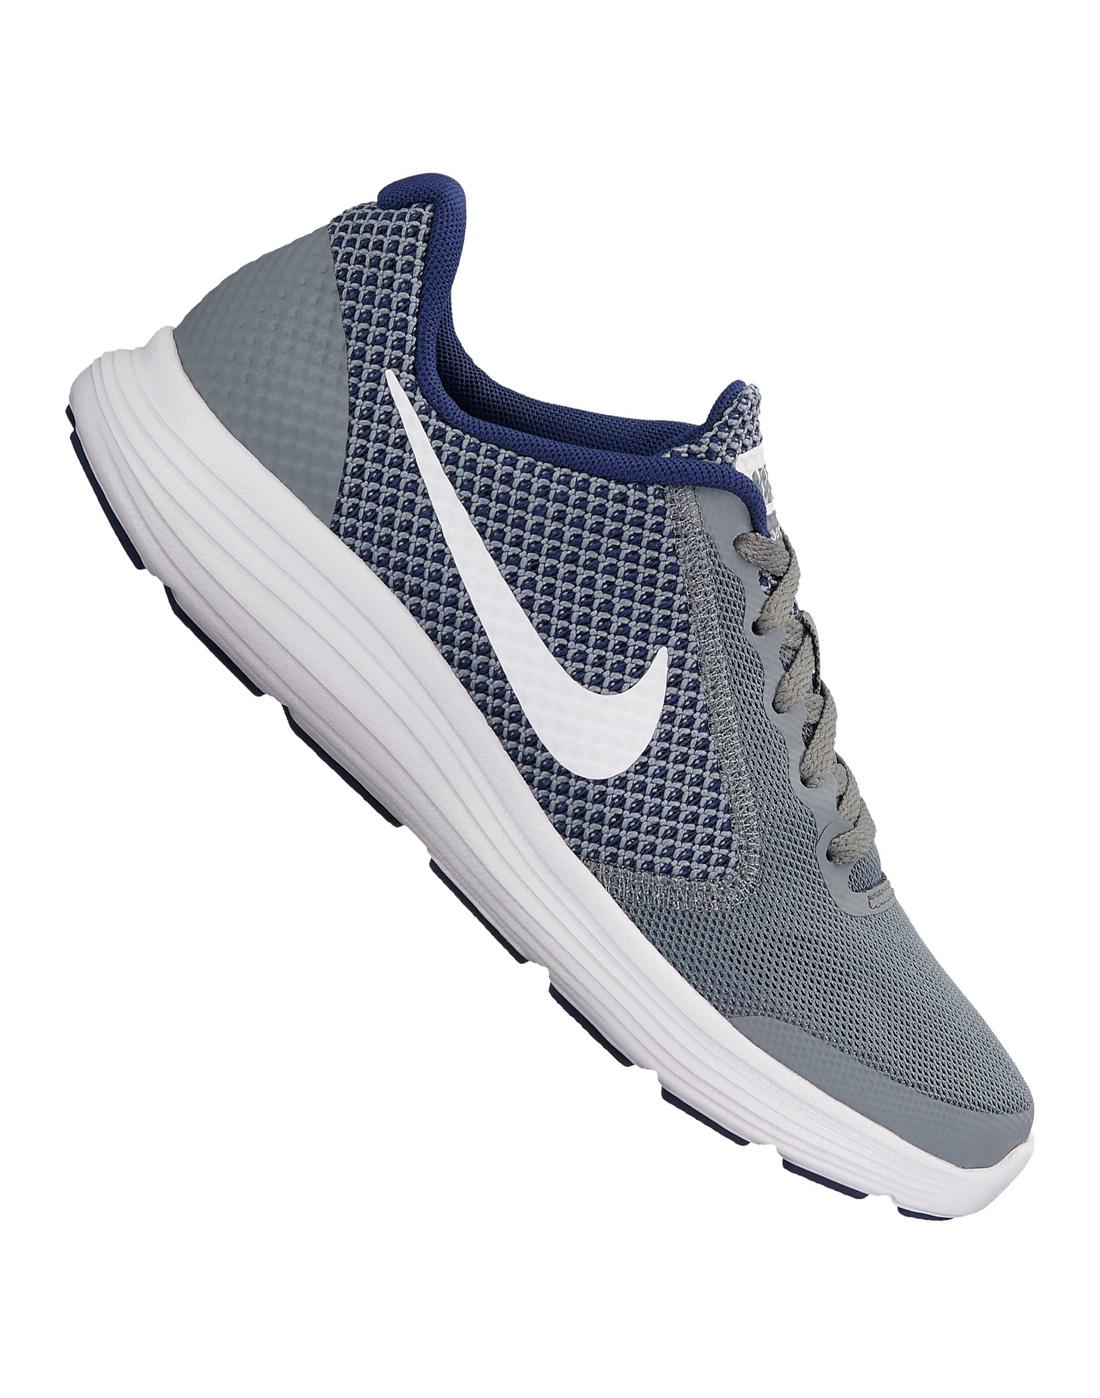 167ebf158d7b0 Nike Older Kids Revolution 3